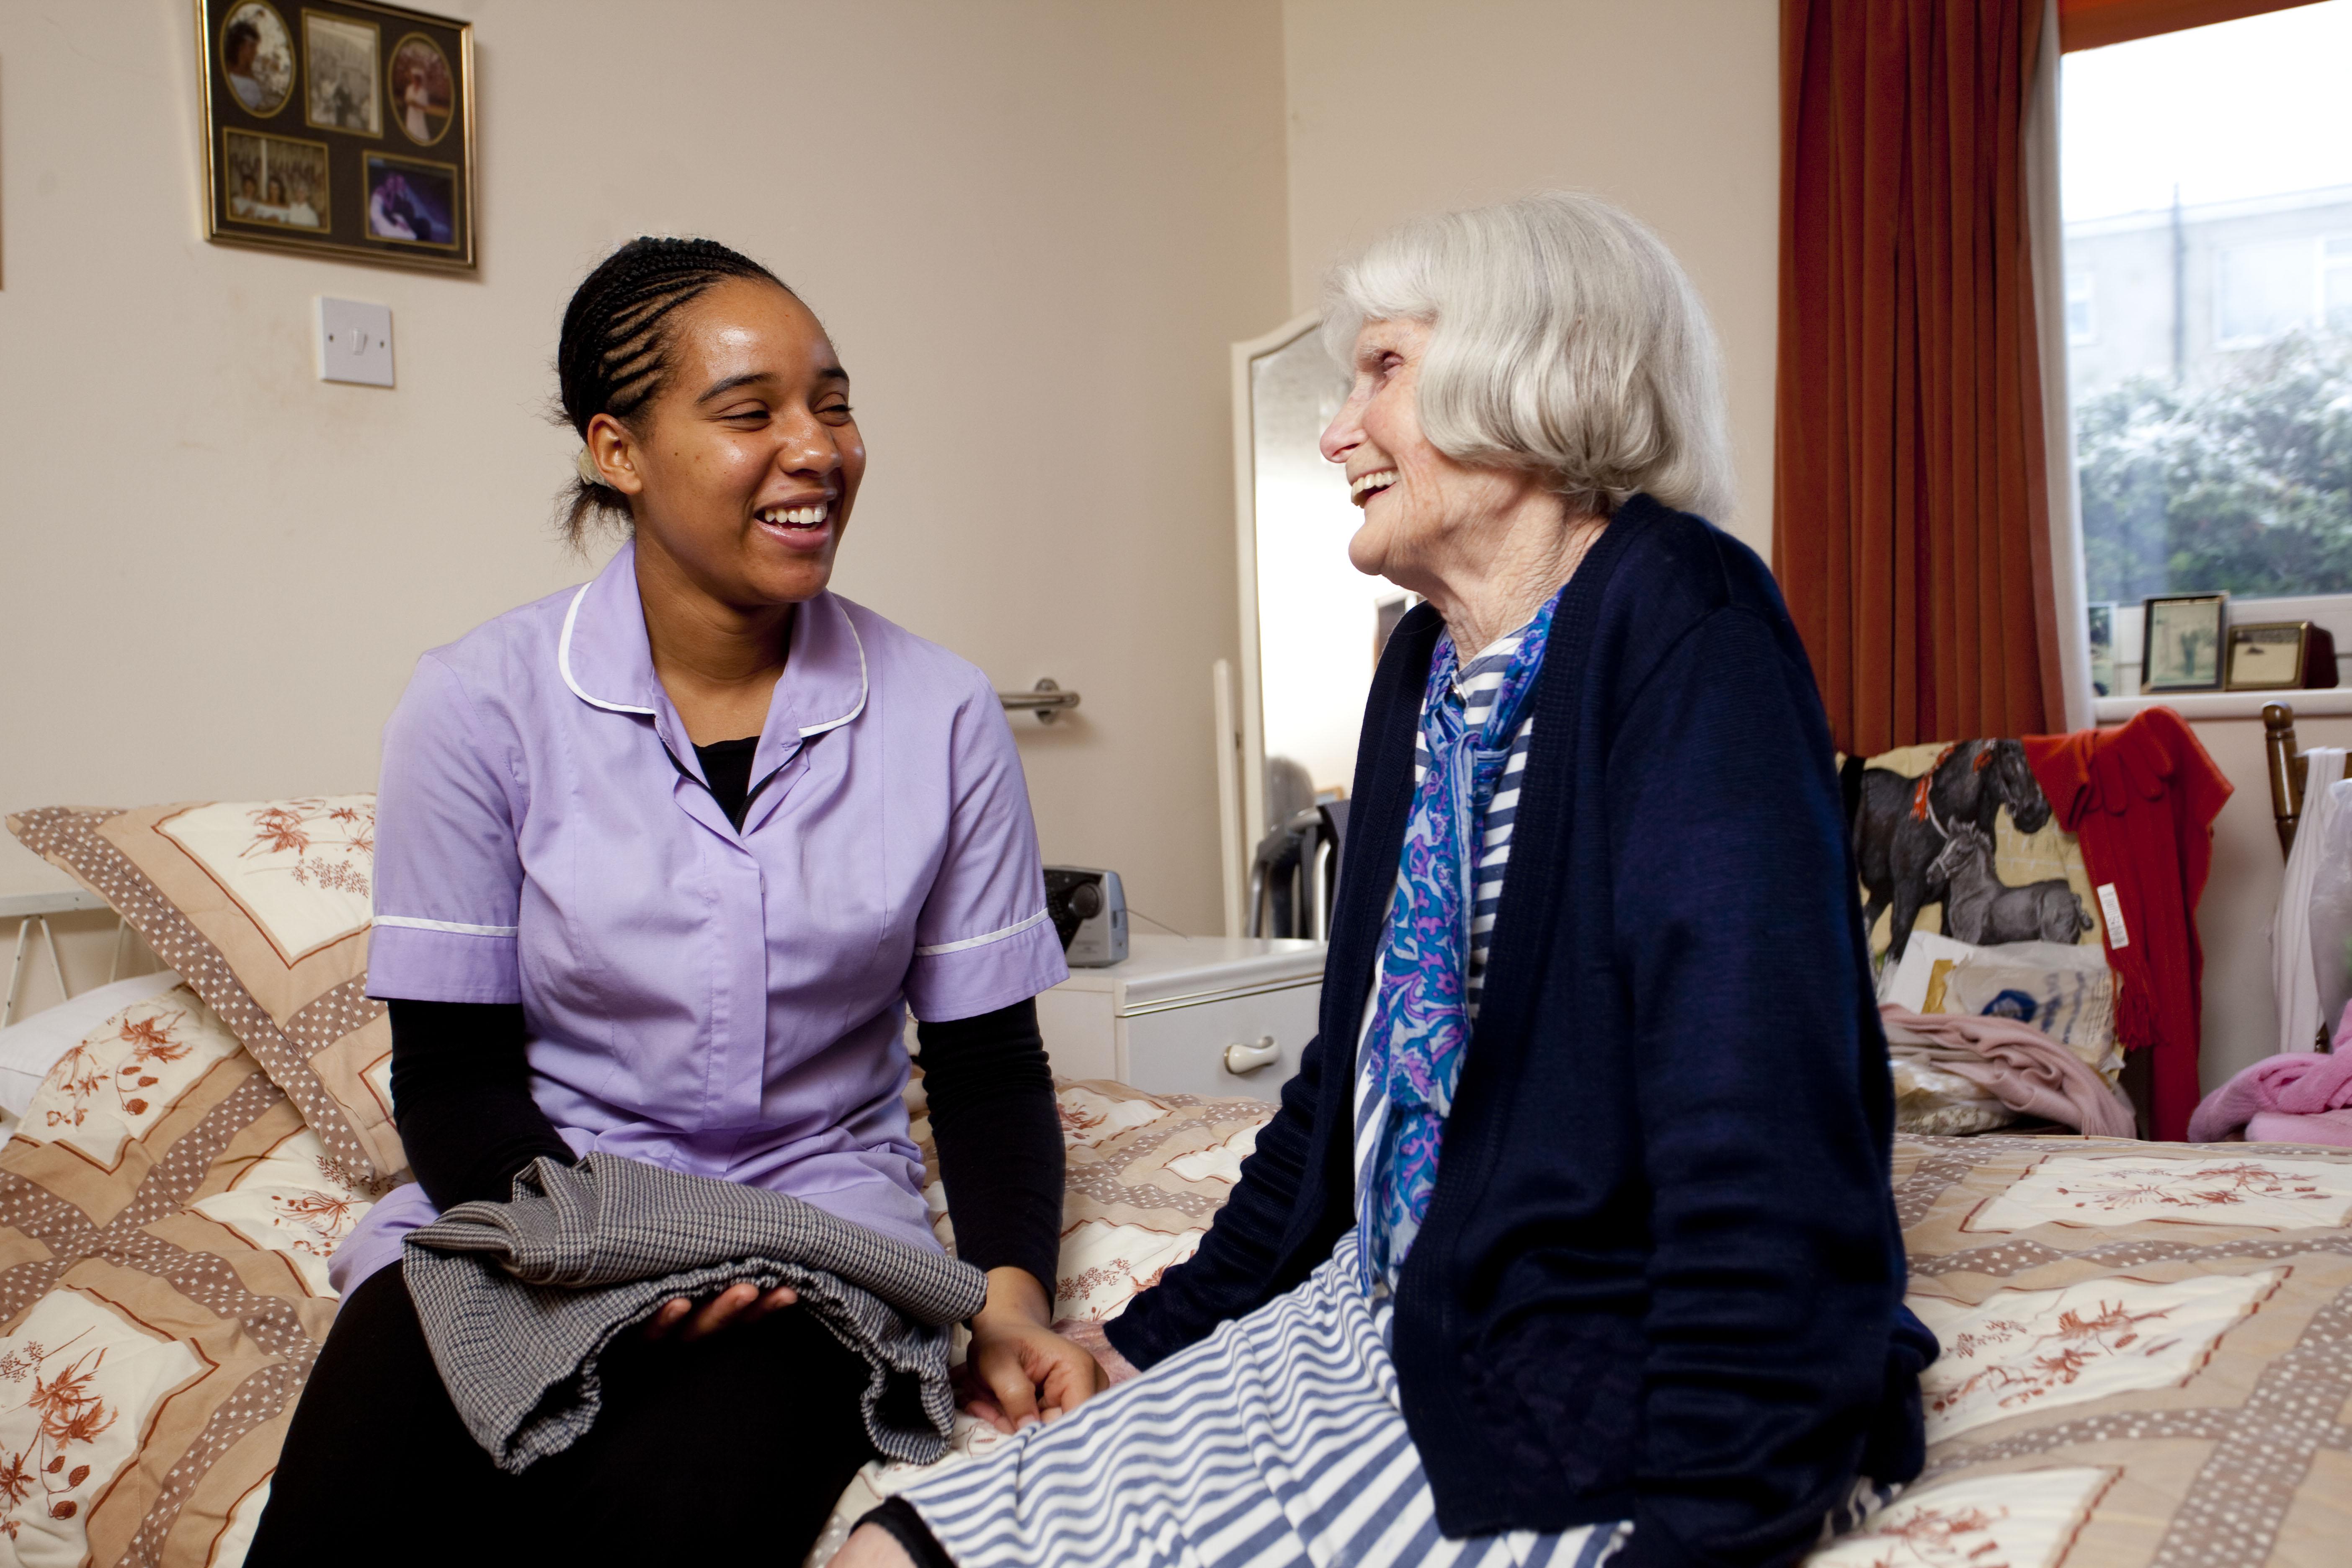 elderly lady and nurse